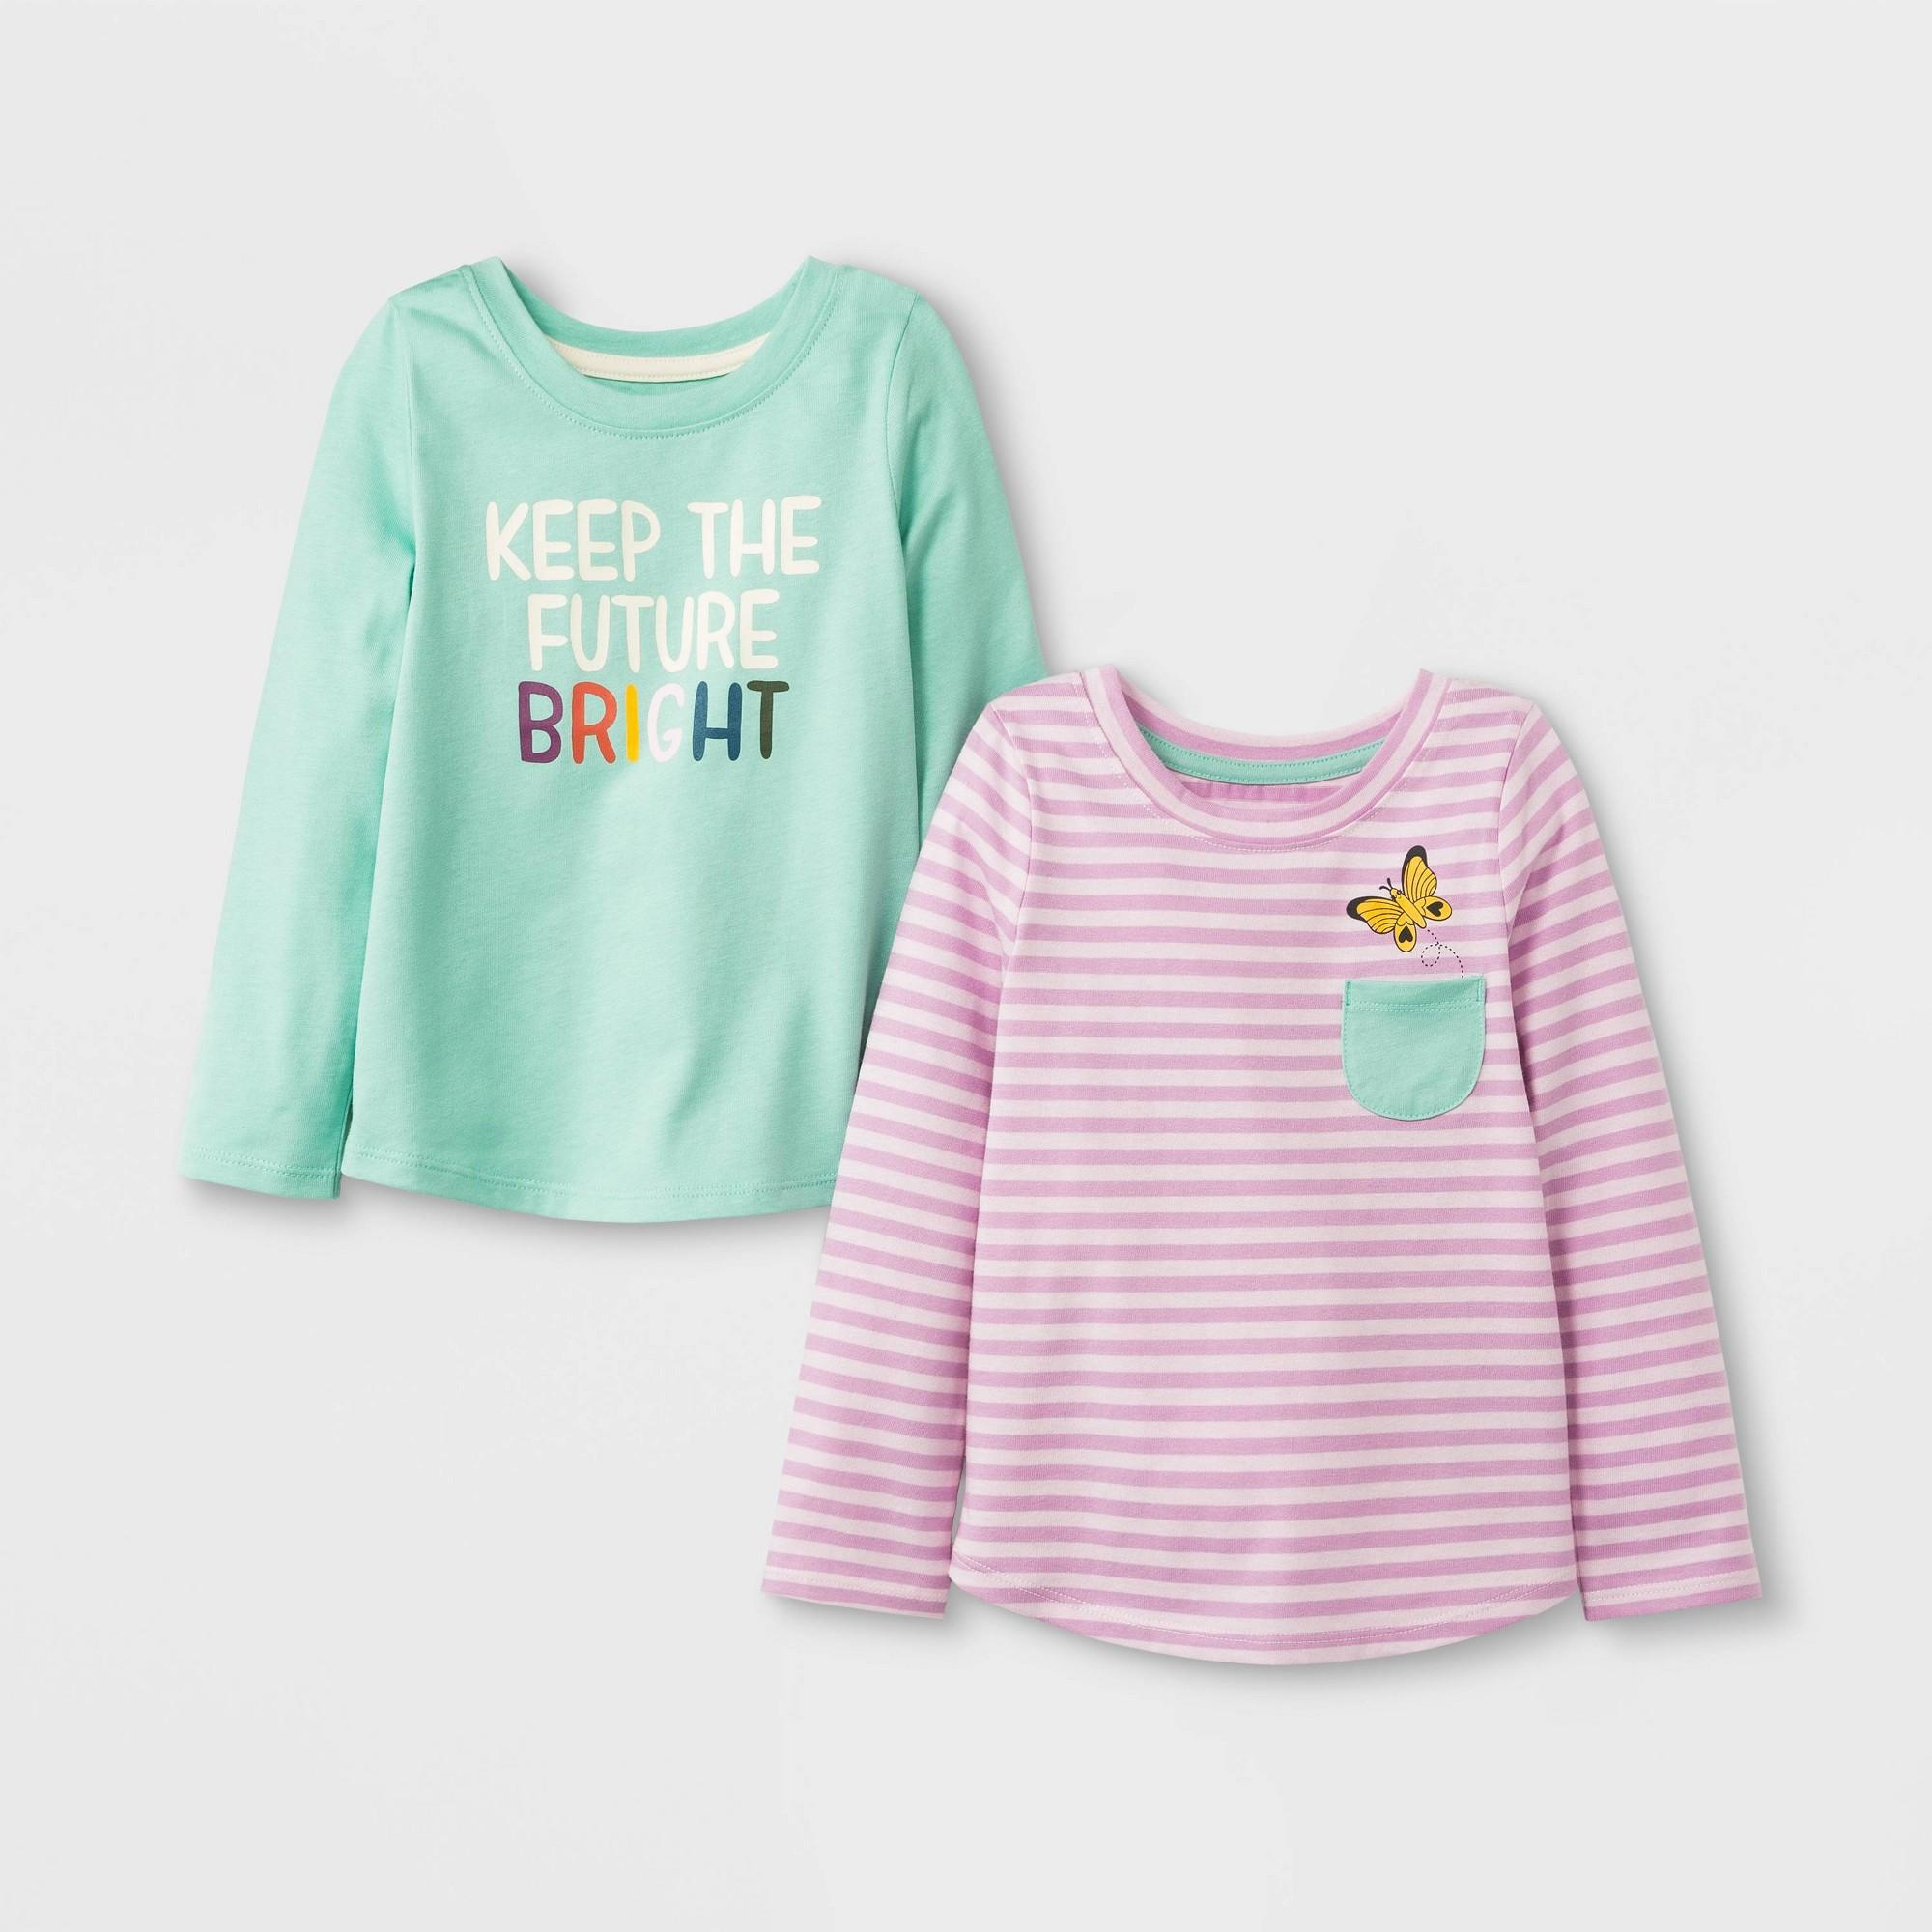 Toddler Girls' 2pk Long Sleeve T-Shirt Set - Cat & Jack Mint/Pink 2T